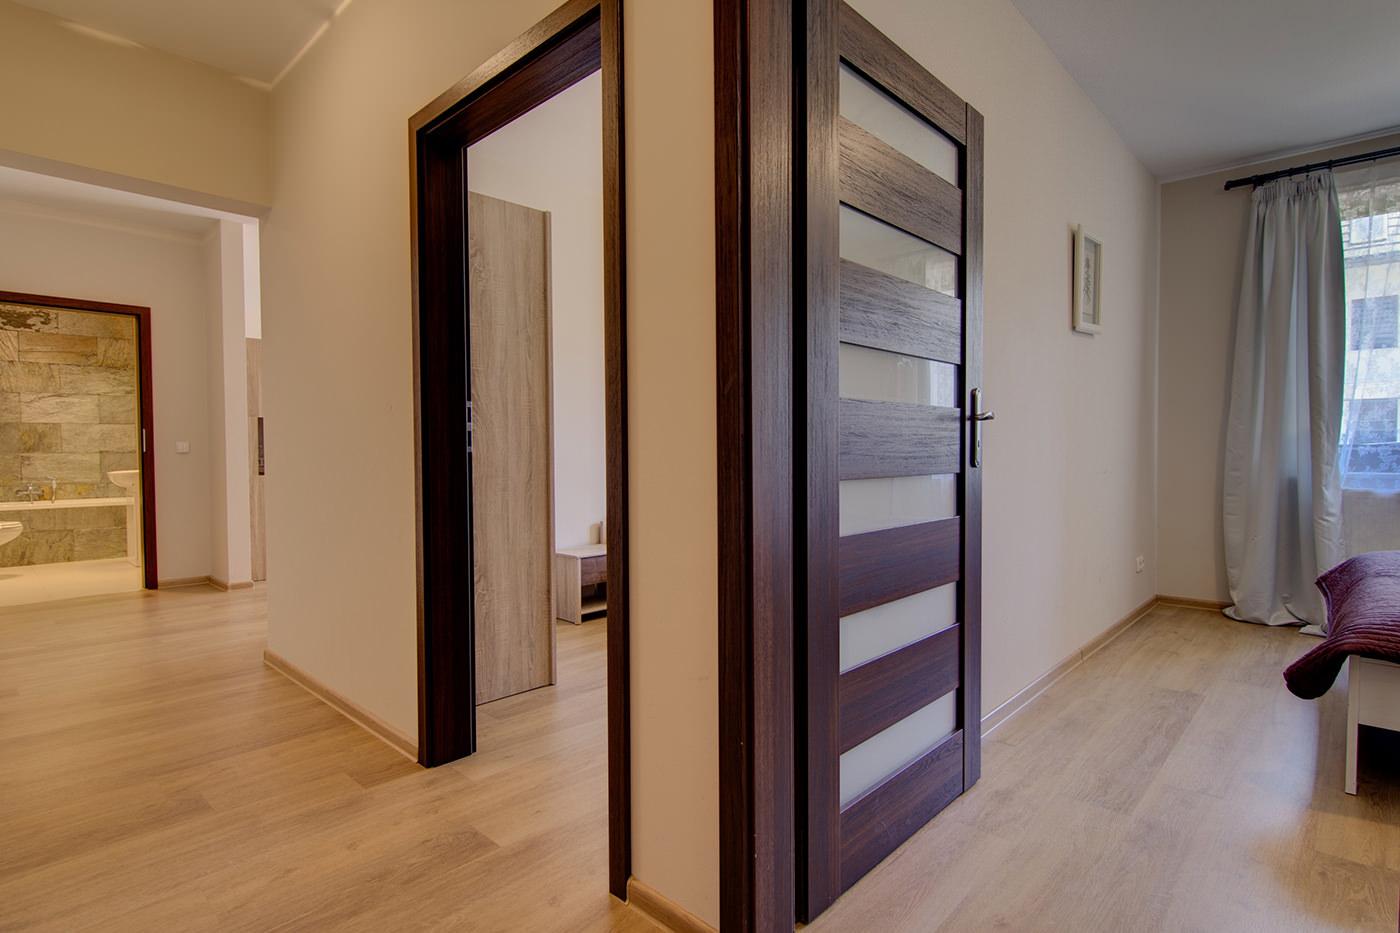 Межкомнатные двери из палисандра